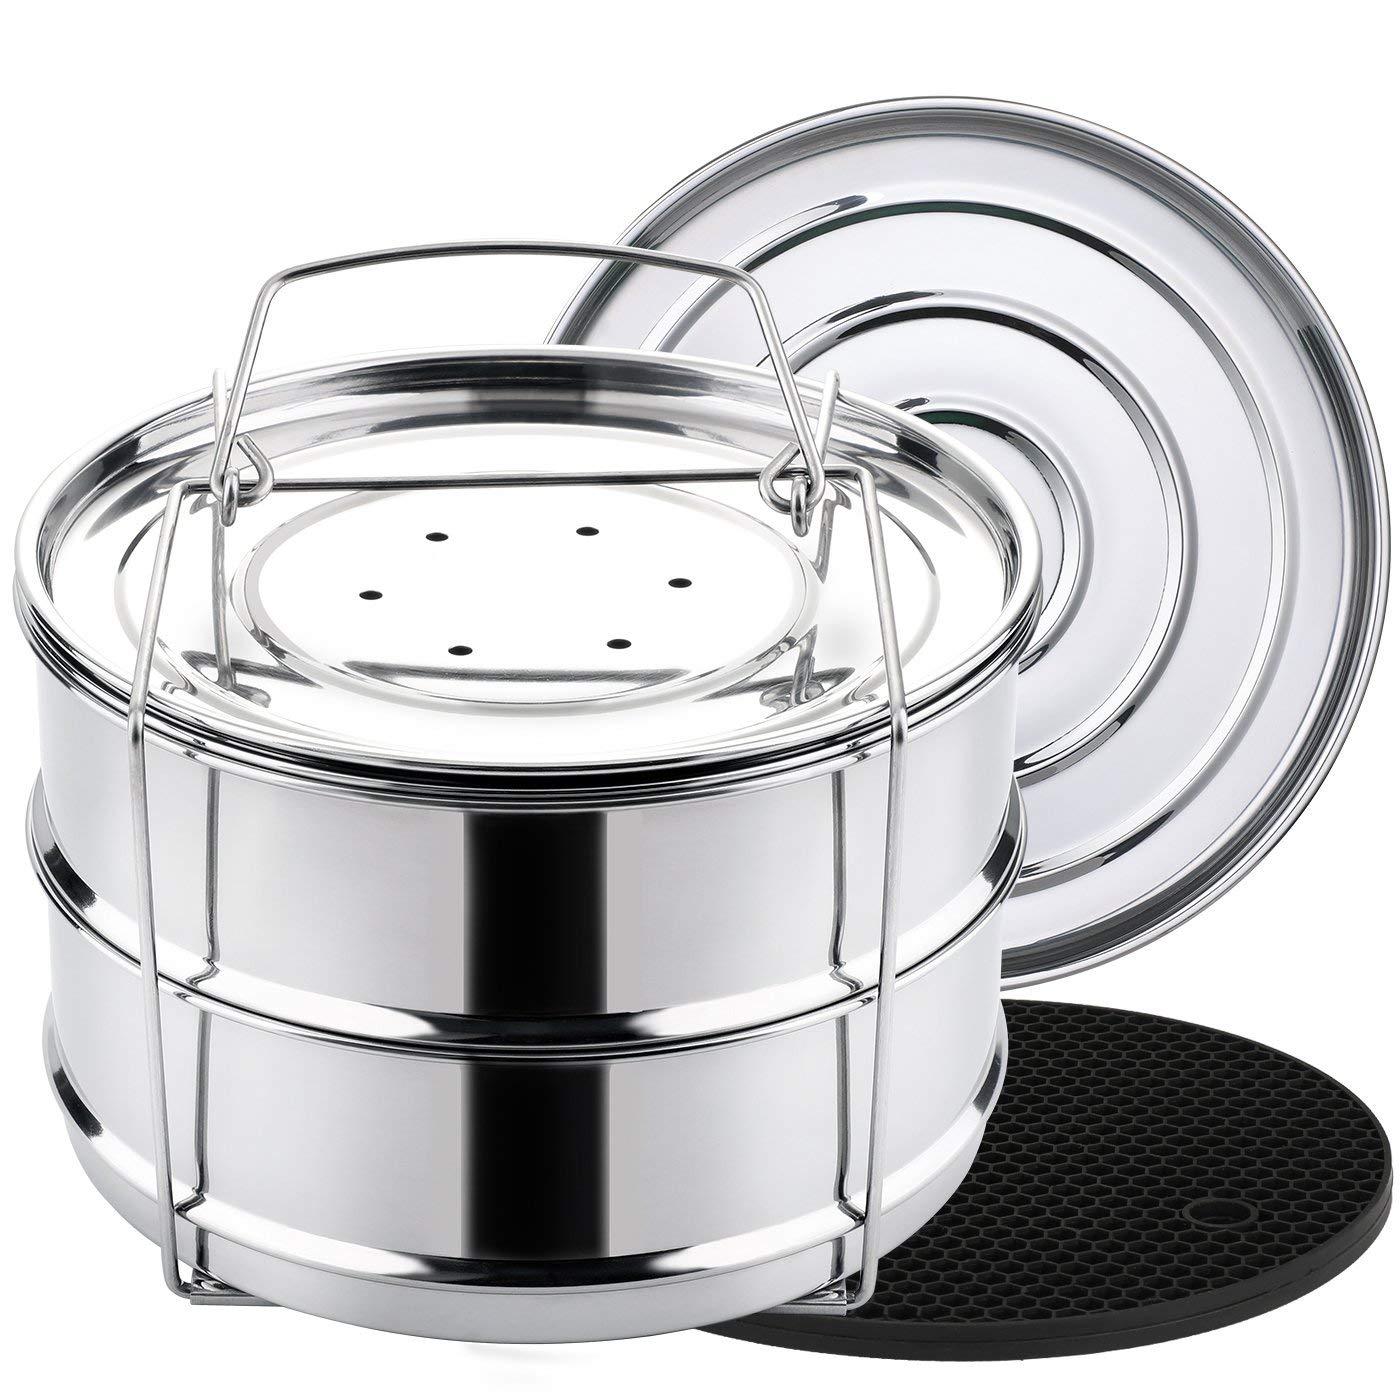 Stackable steamer pans for Instant Pot